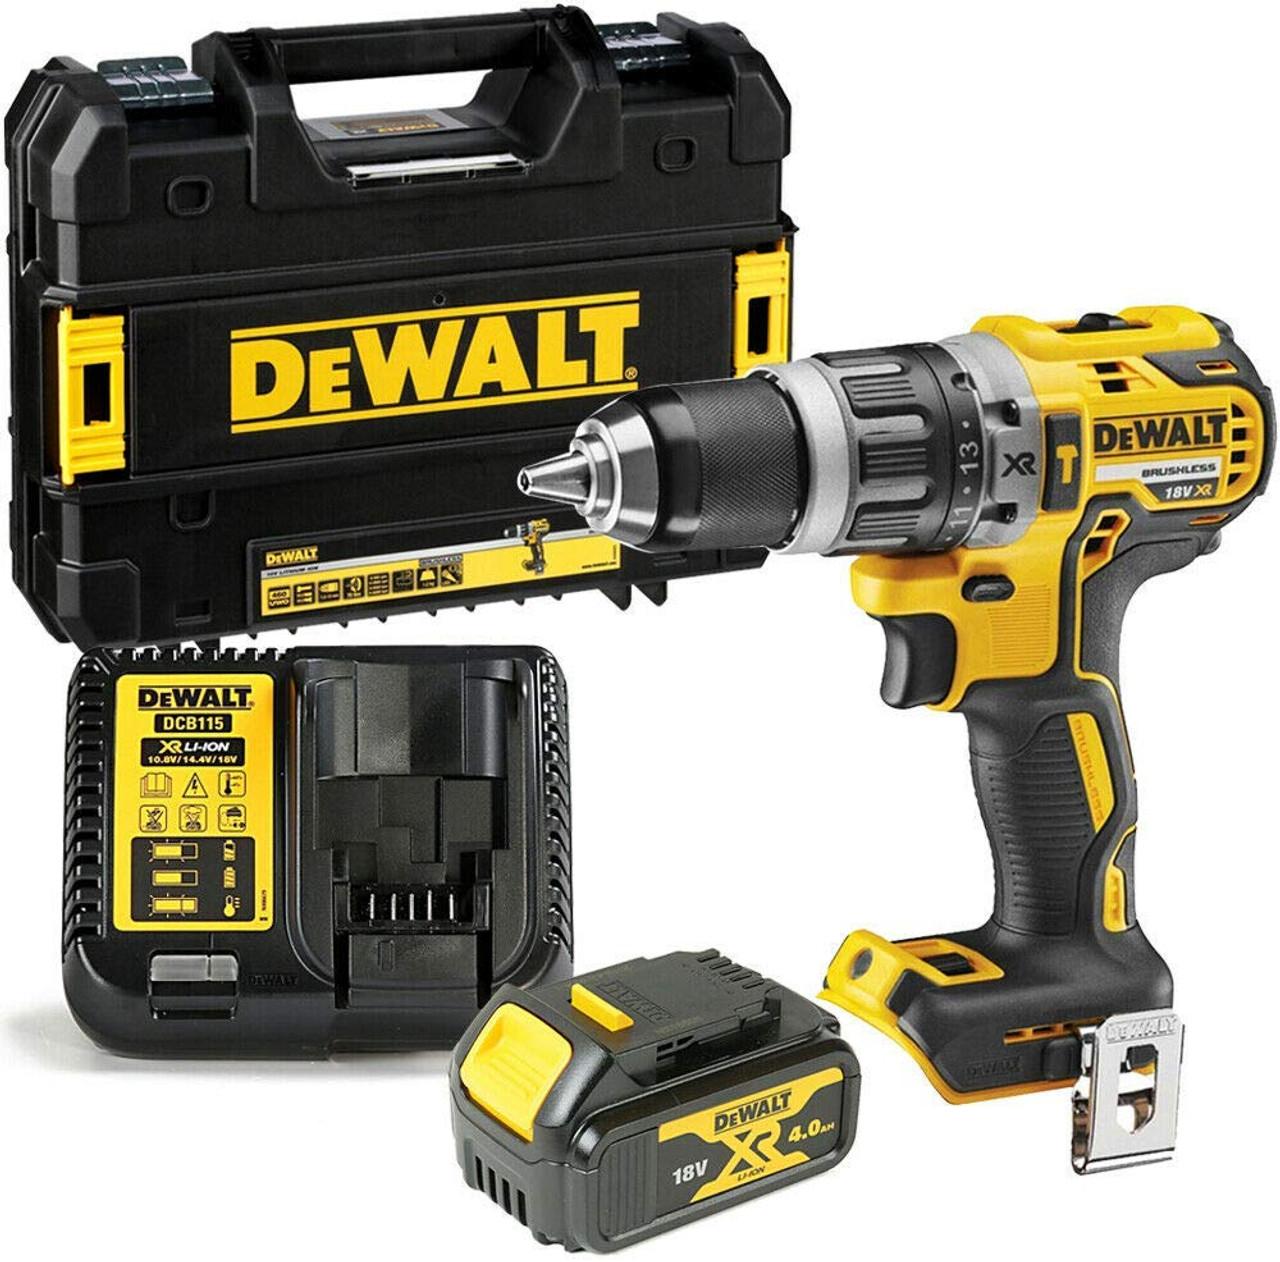 DeWalt DCD796M1 XR Brushless Hammer Drill 18v 1 x 4.0Ah Li-Ion